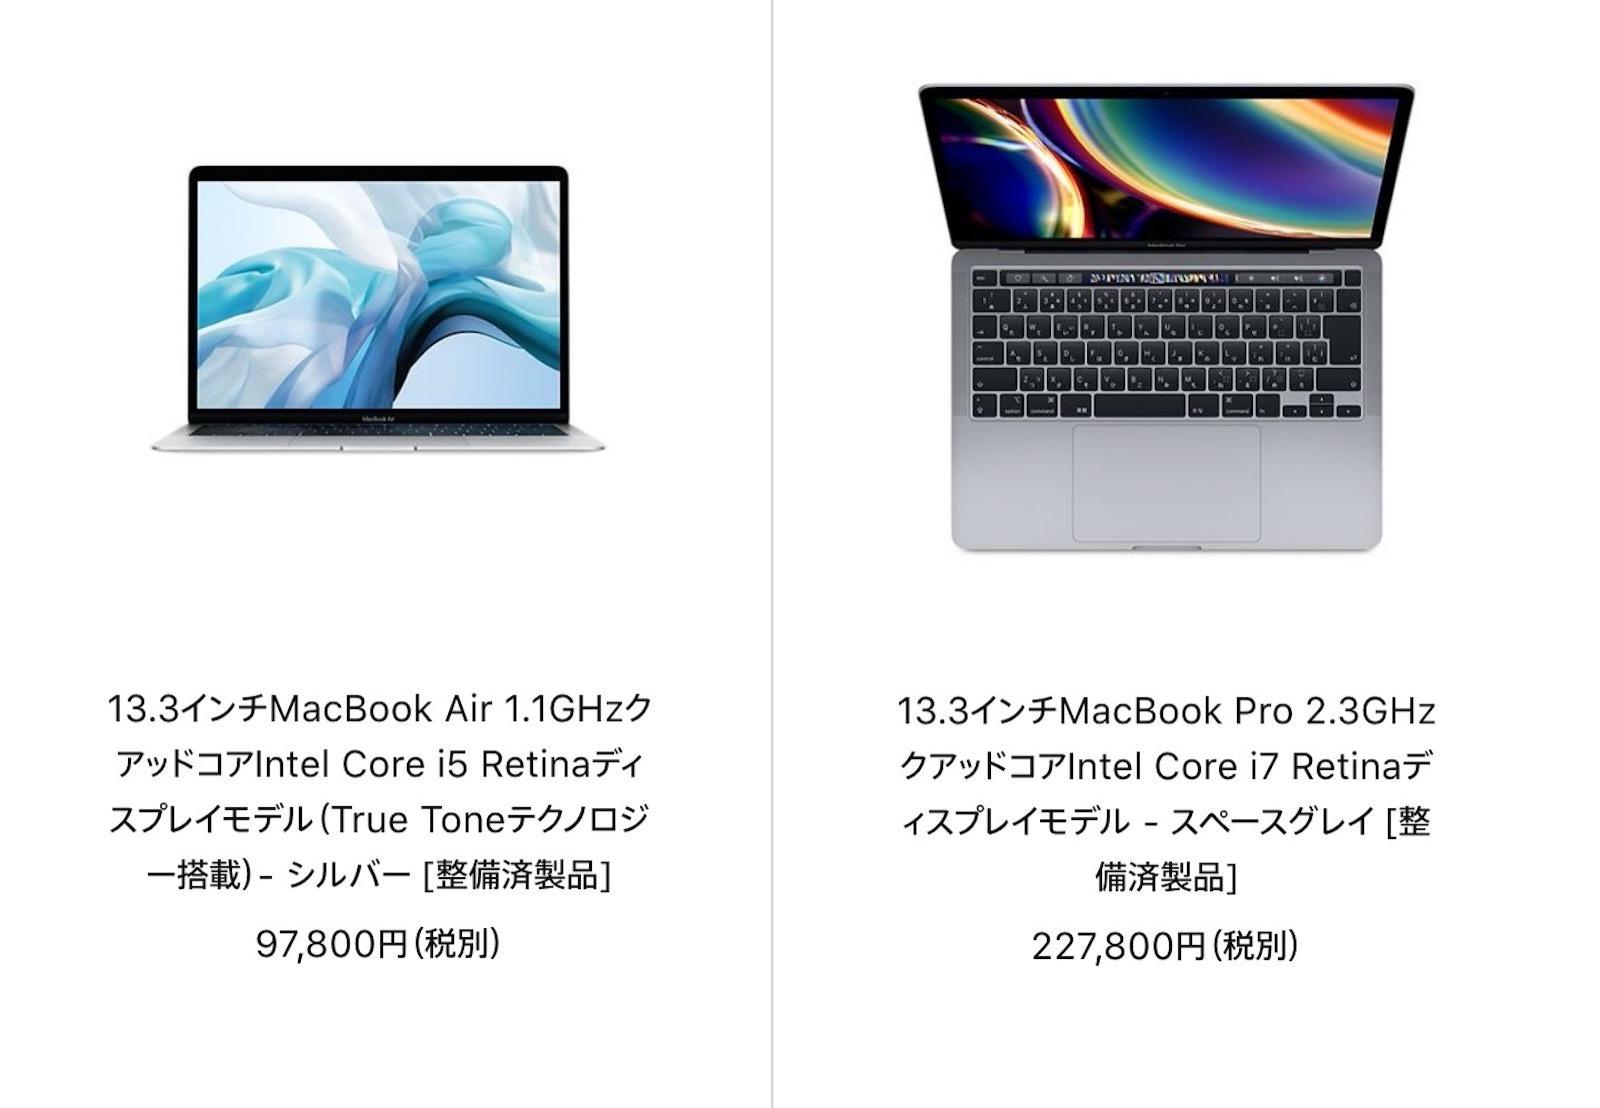 Macbookair and macbook pro refurbished